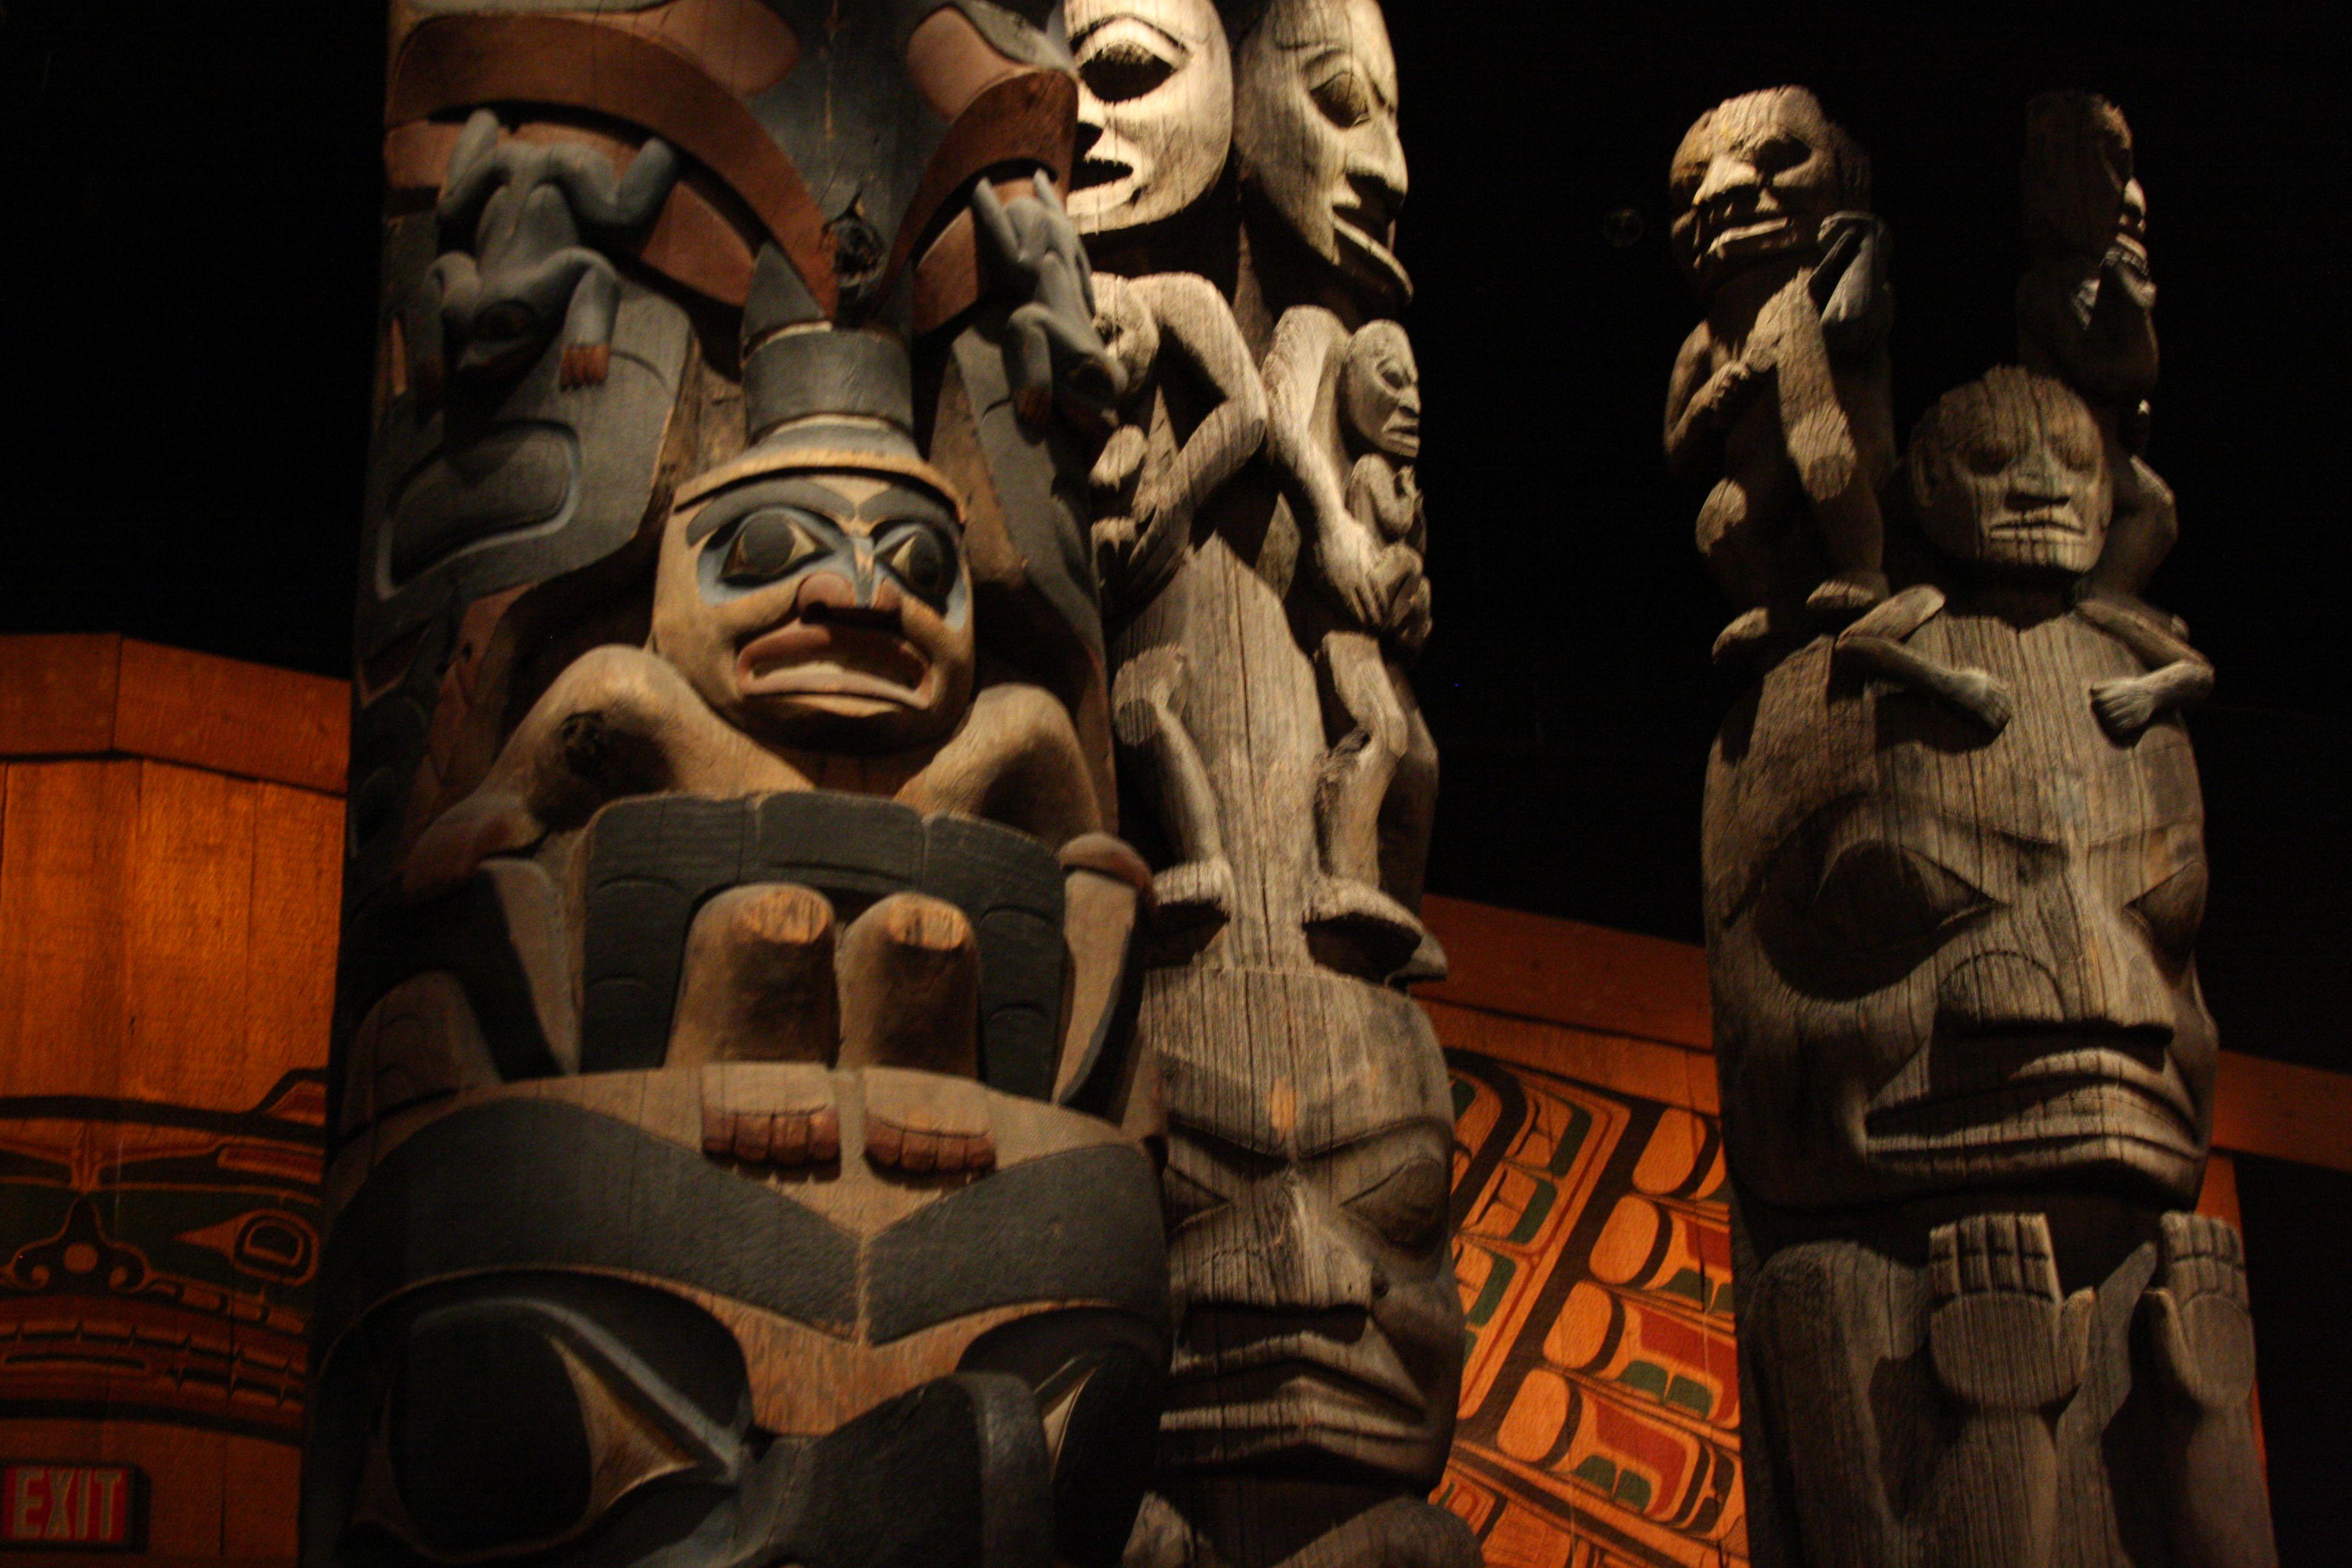 Hall of Totems at the Royal British Columbia Museum, Victoria, BC